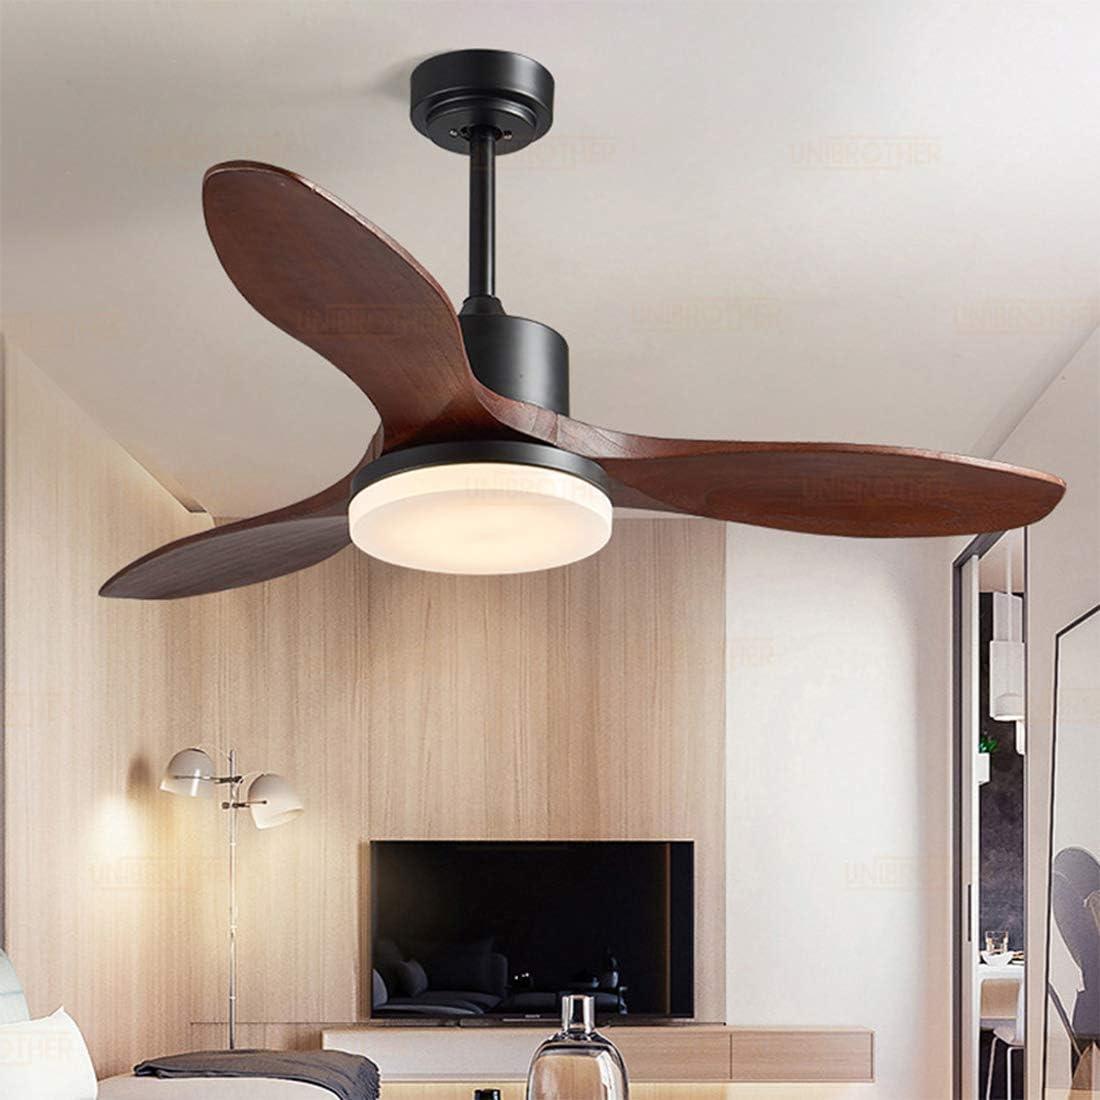 Ventilador de Techo Silencioso con Mando a Distancia, Reversible Ventilador,3* Hoja de Abanico de Madera,LED Luz Variable de 3 Colores Plafón,para Salón Dormitorio Sala de Estar, 122cm